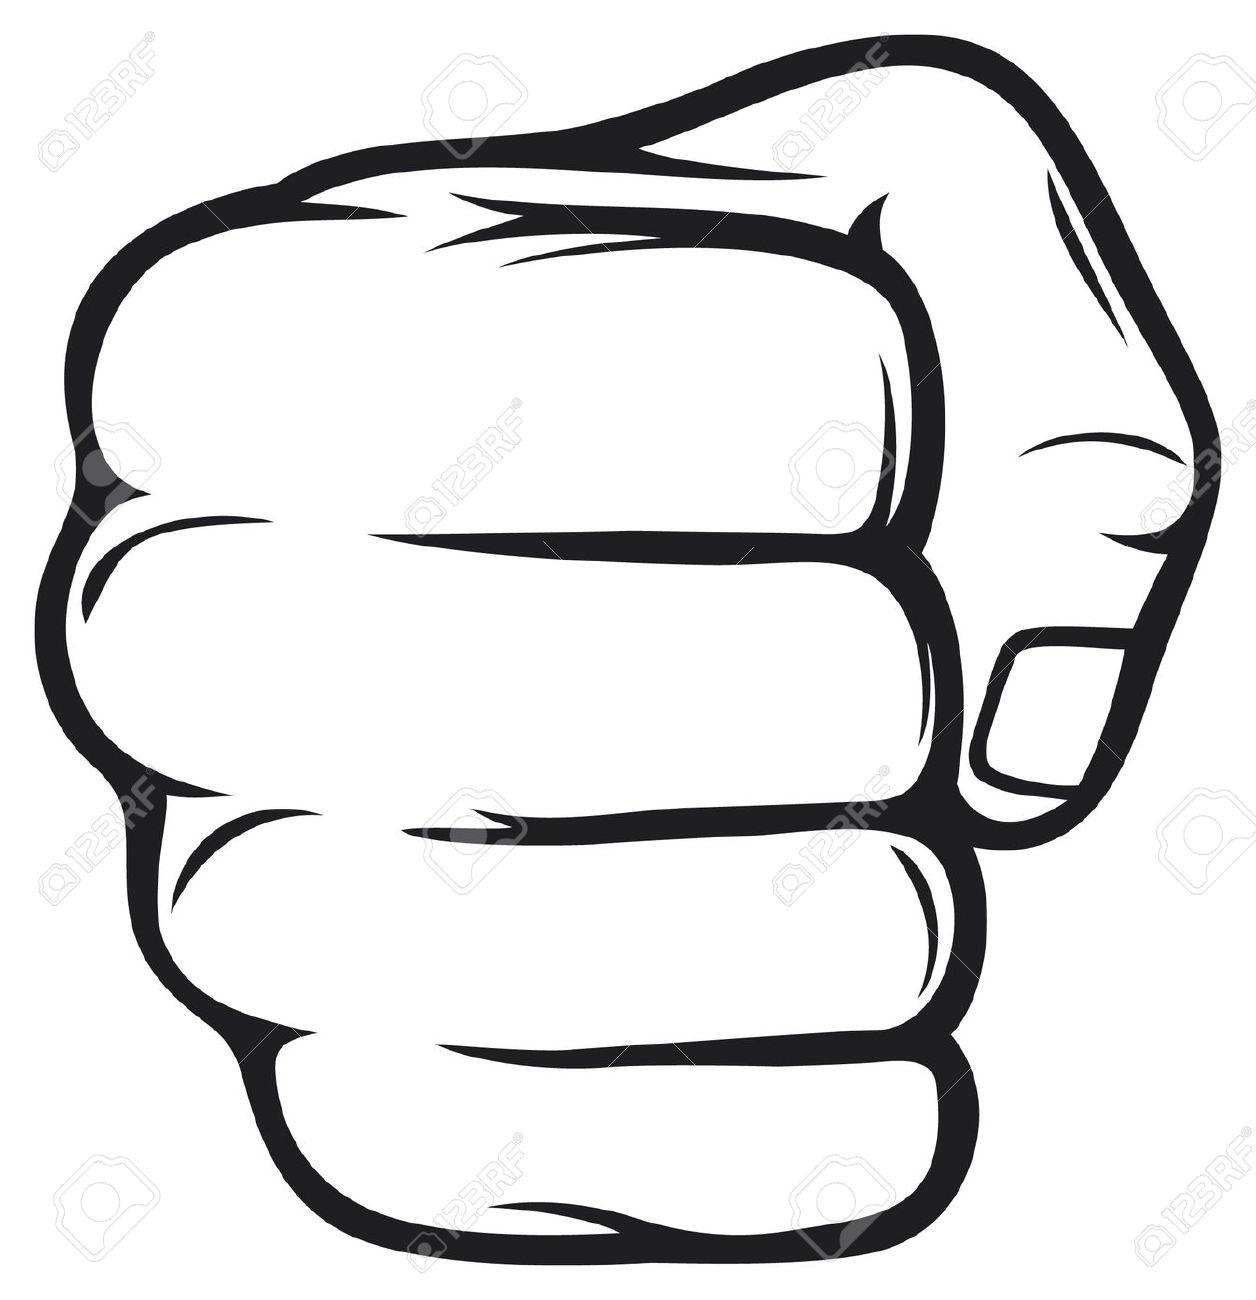 Fist clipart fist punch Clipart Fist (5830) Clipartwork Free